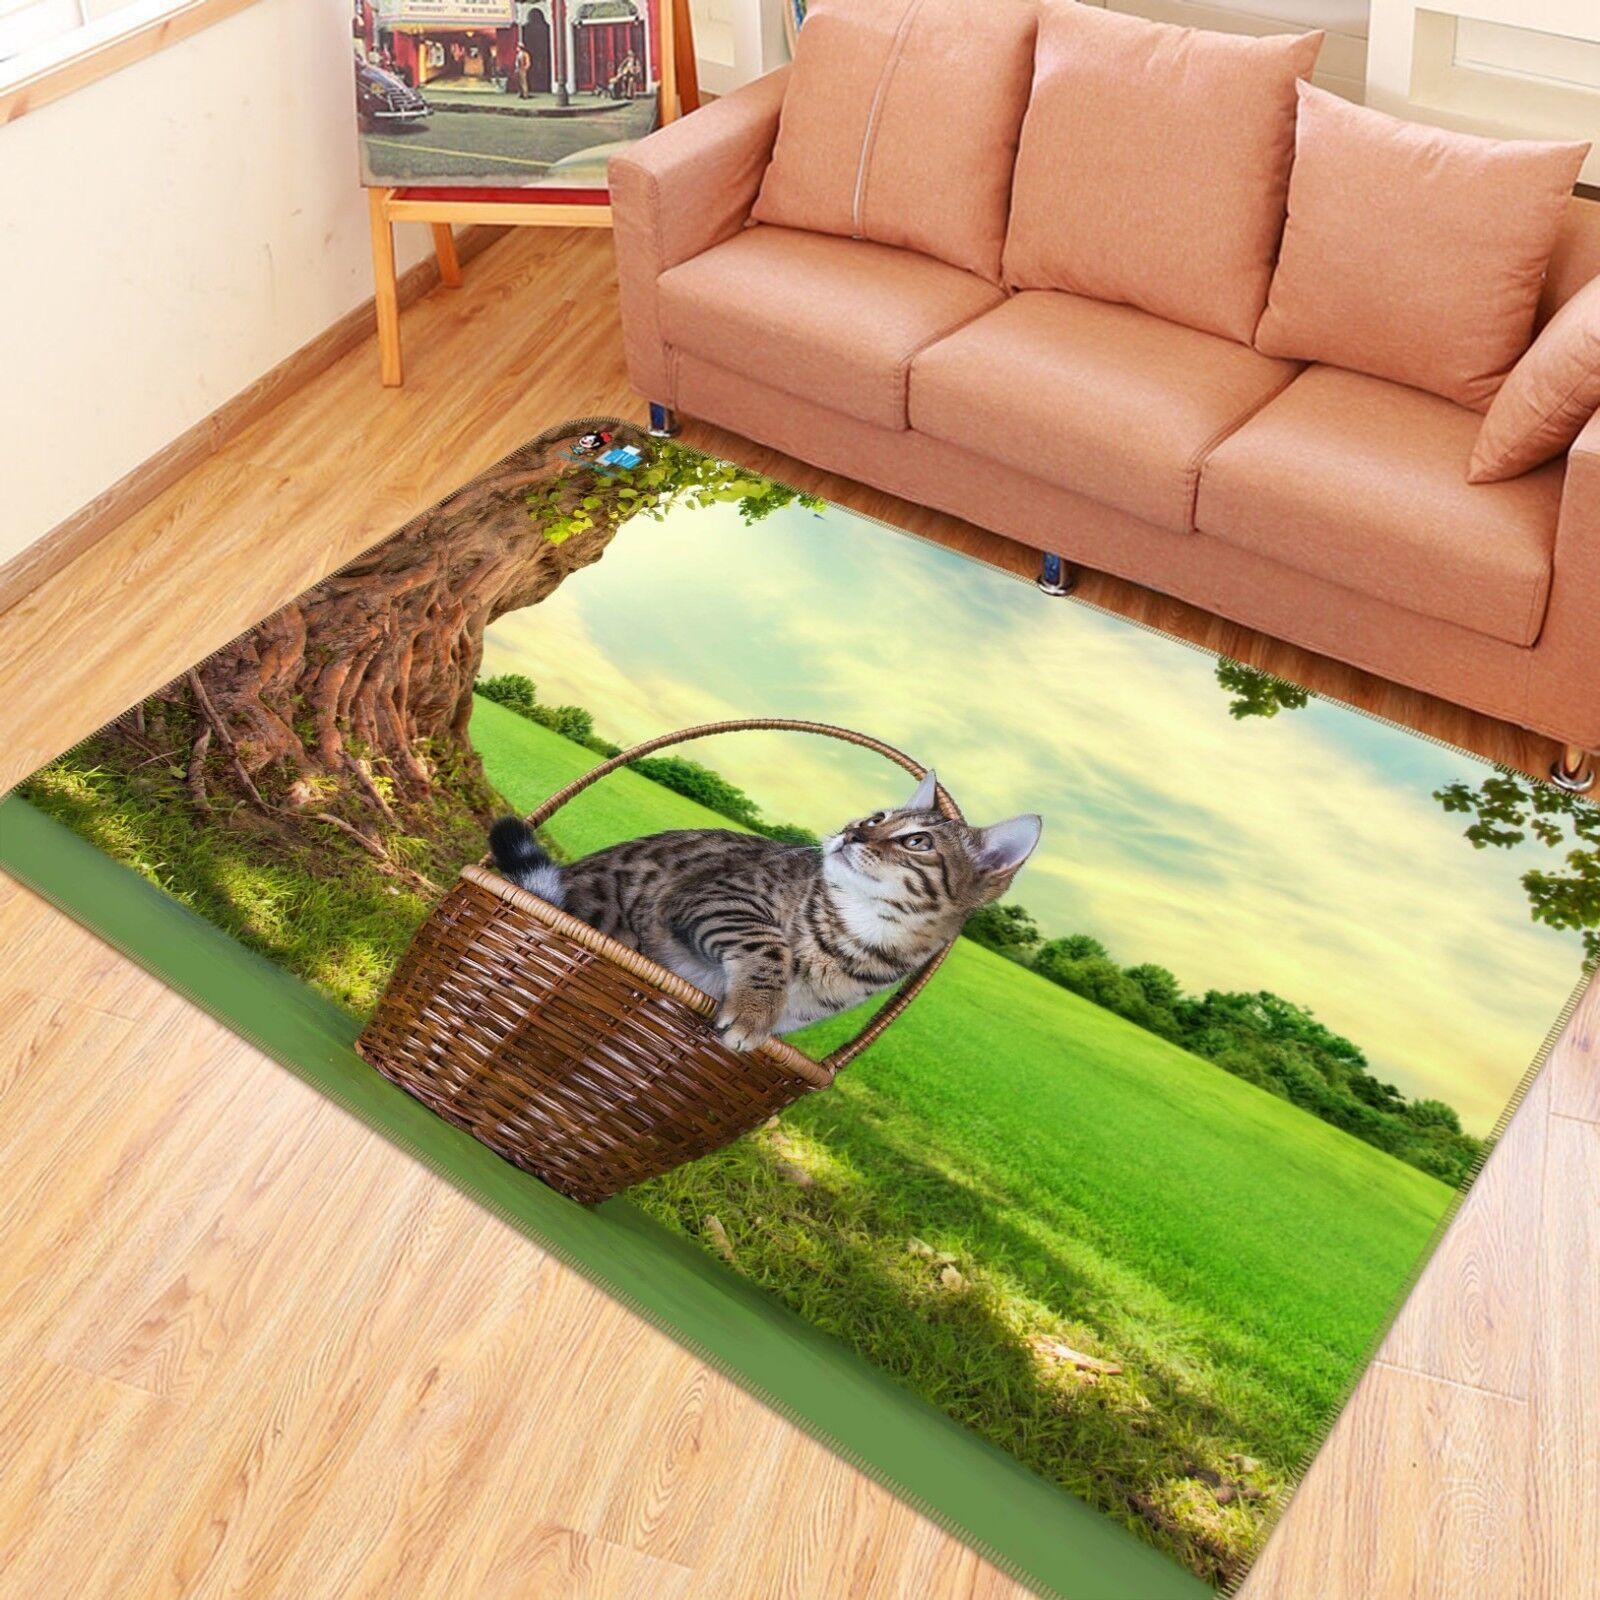 3D cat prato 110 tappetino antiscivolo tappeto camera Tappetino Qualità Elegante foto Tappeto UK Estate